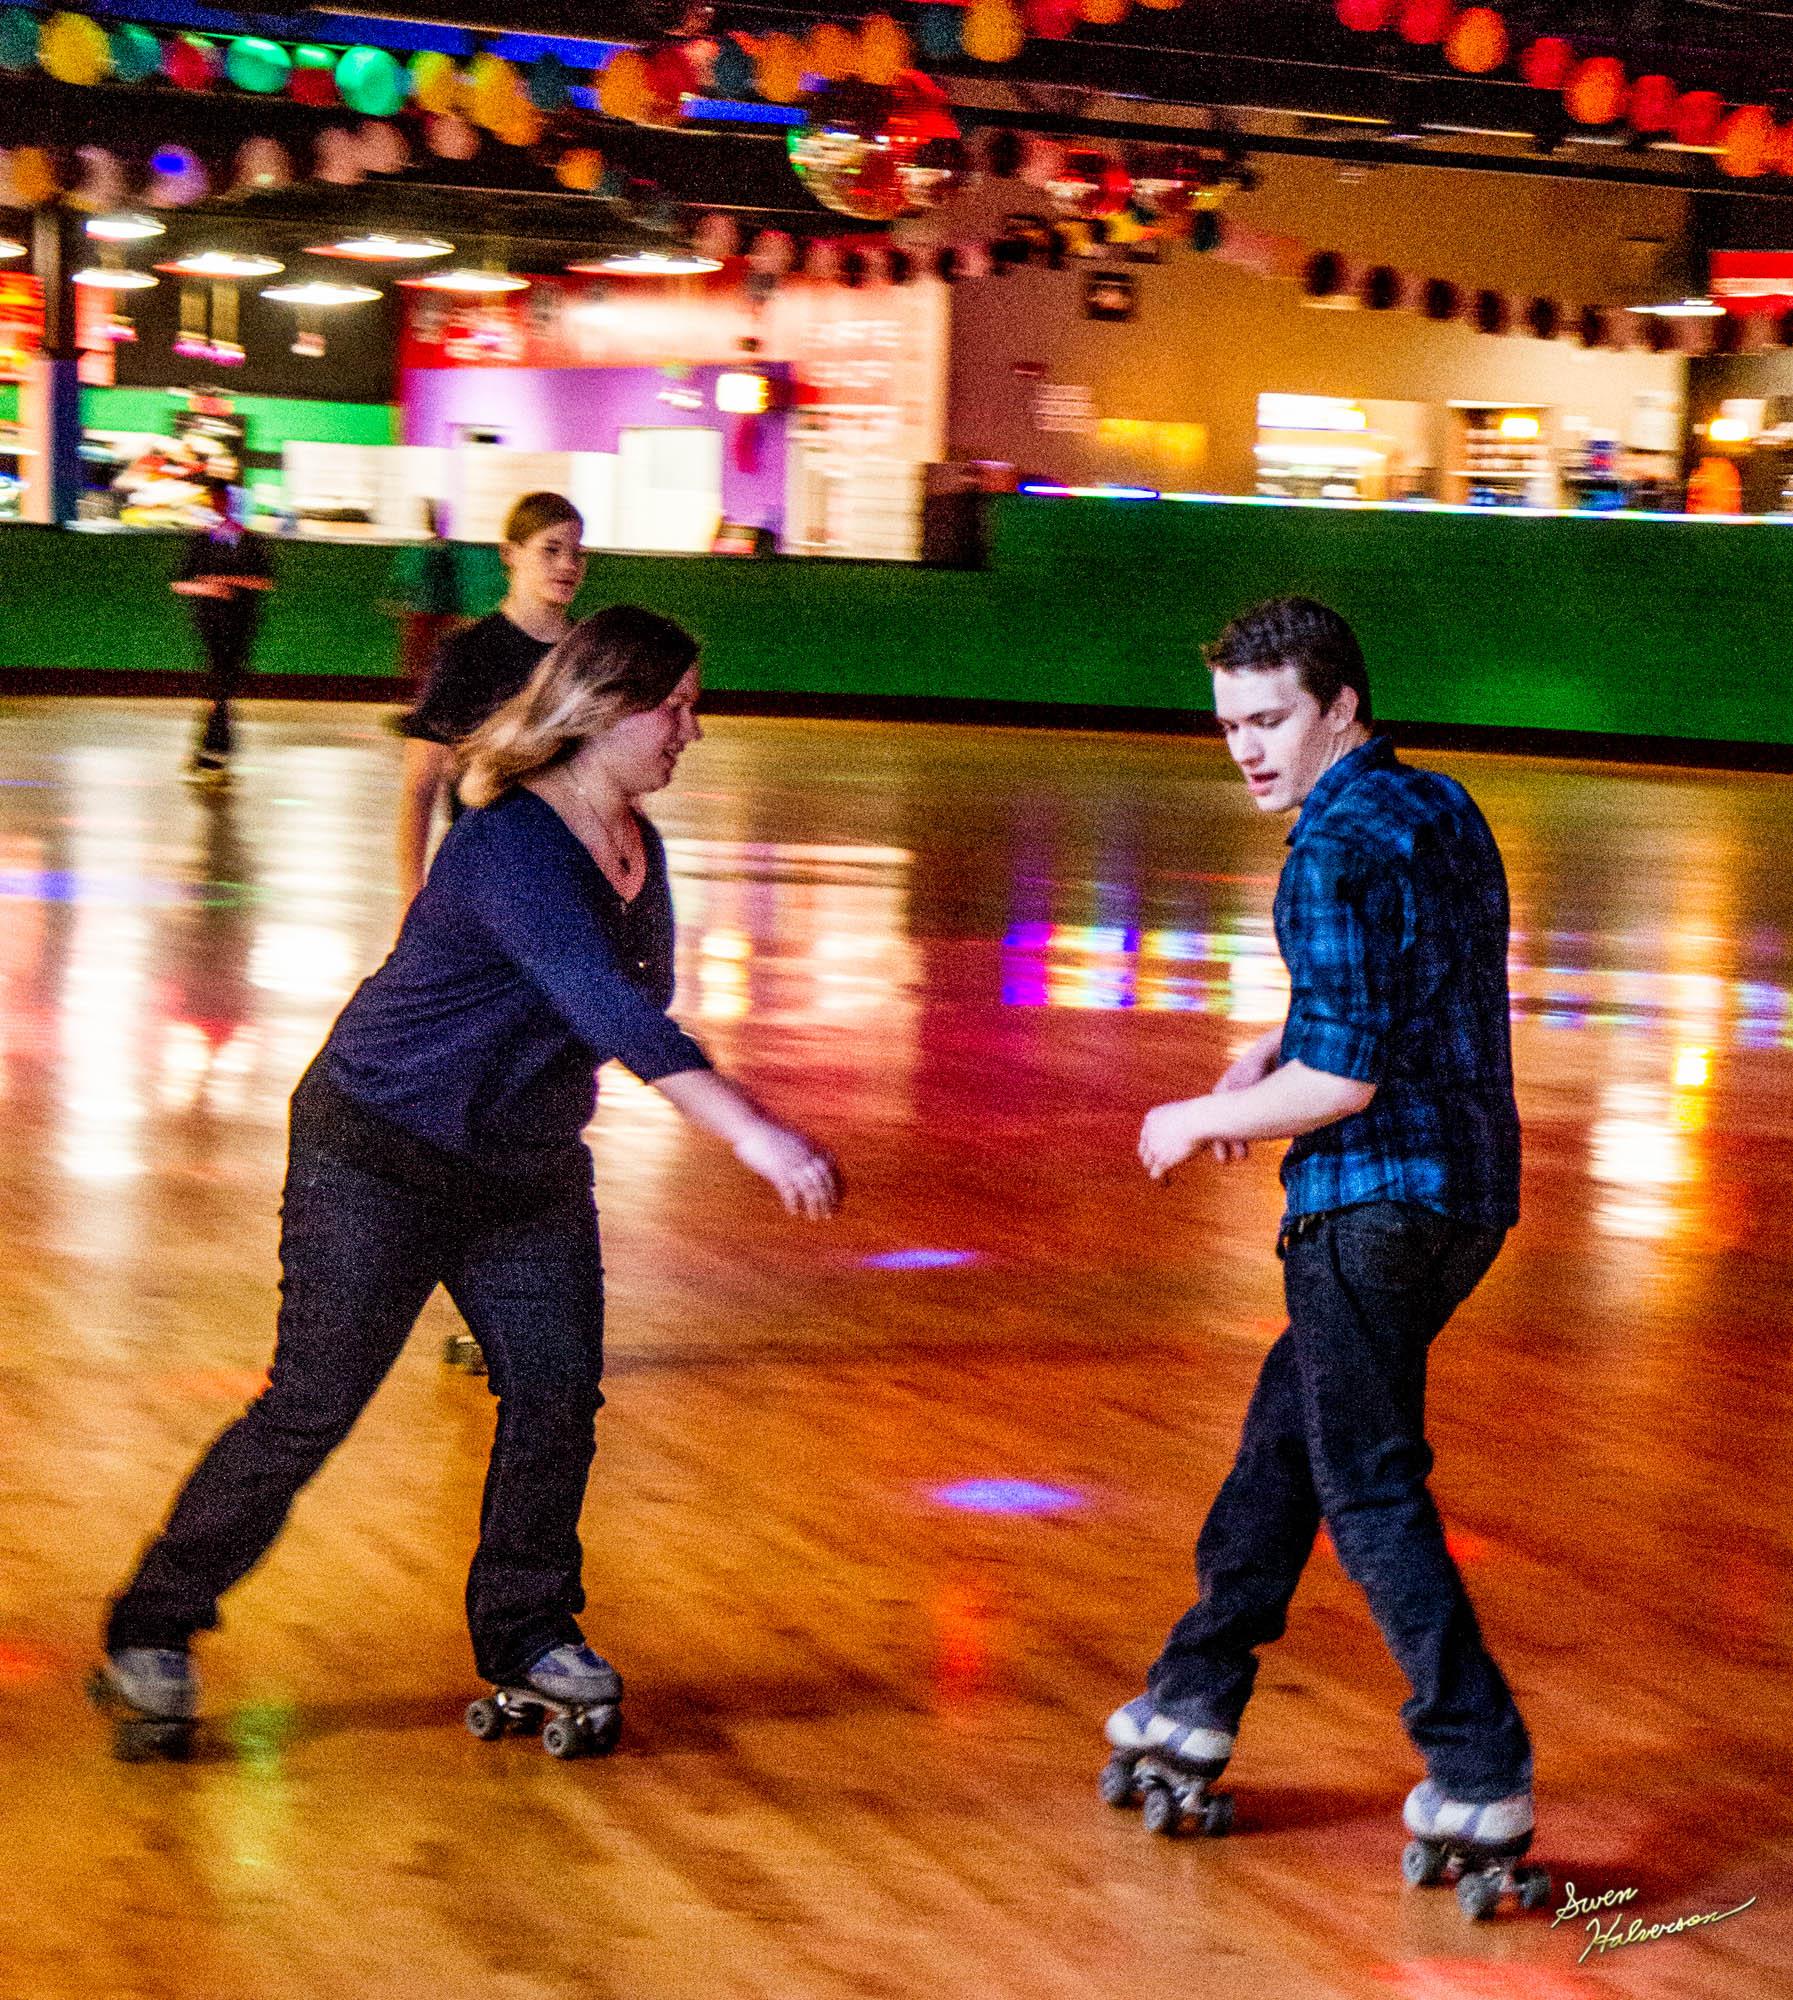 Theme:Skate| Title: Skating Backwards in Color